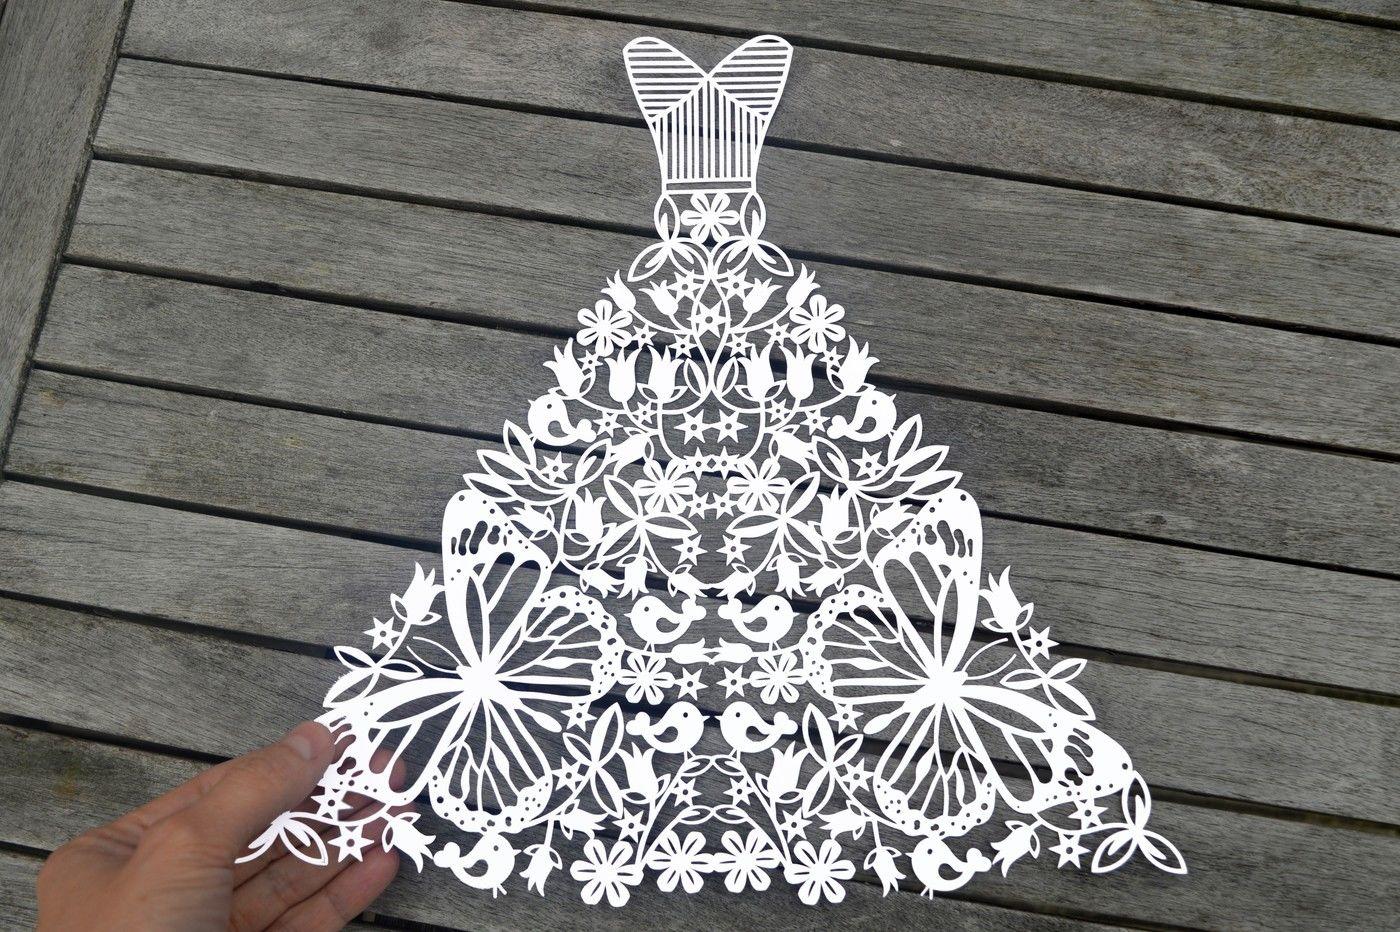 Wedding Dress Svg Dxf Eps Files By Digital Gems Thehungryjpeg Com